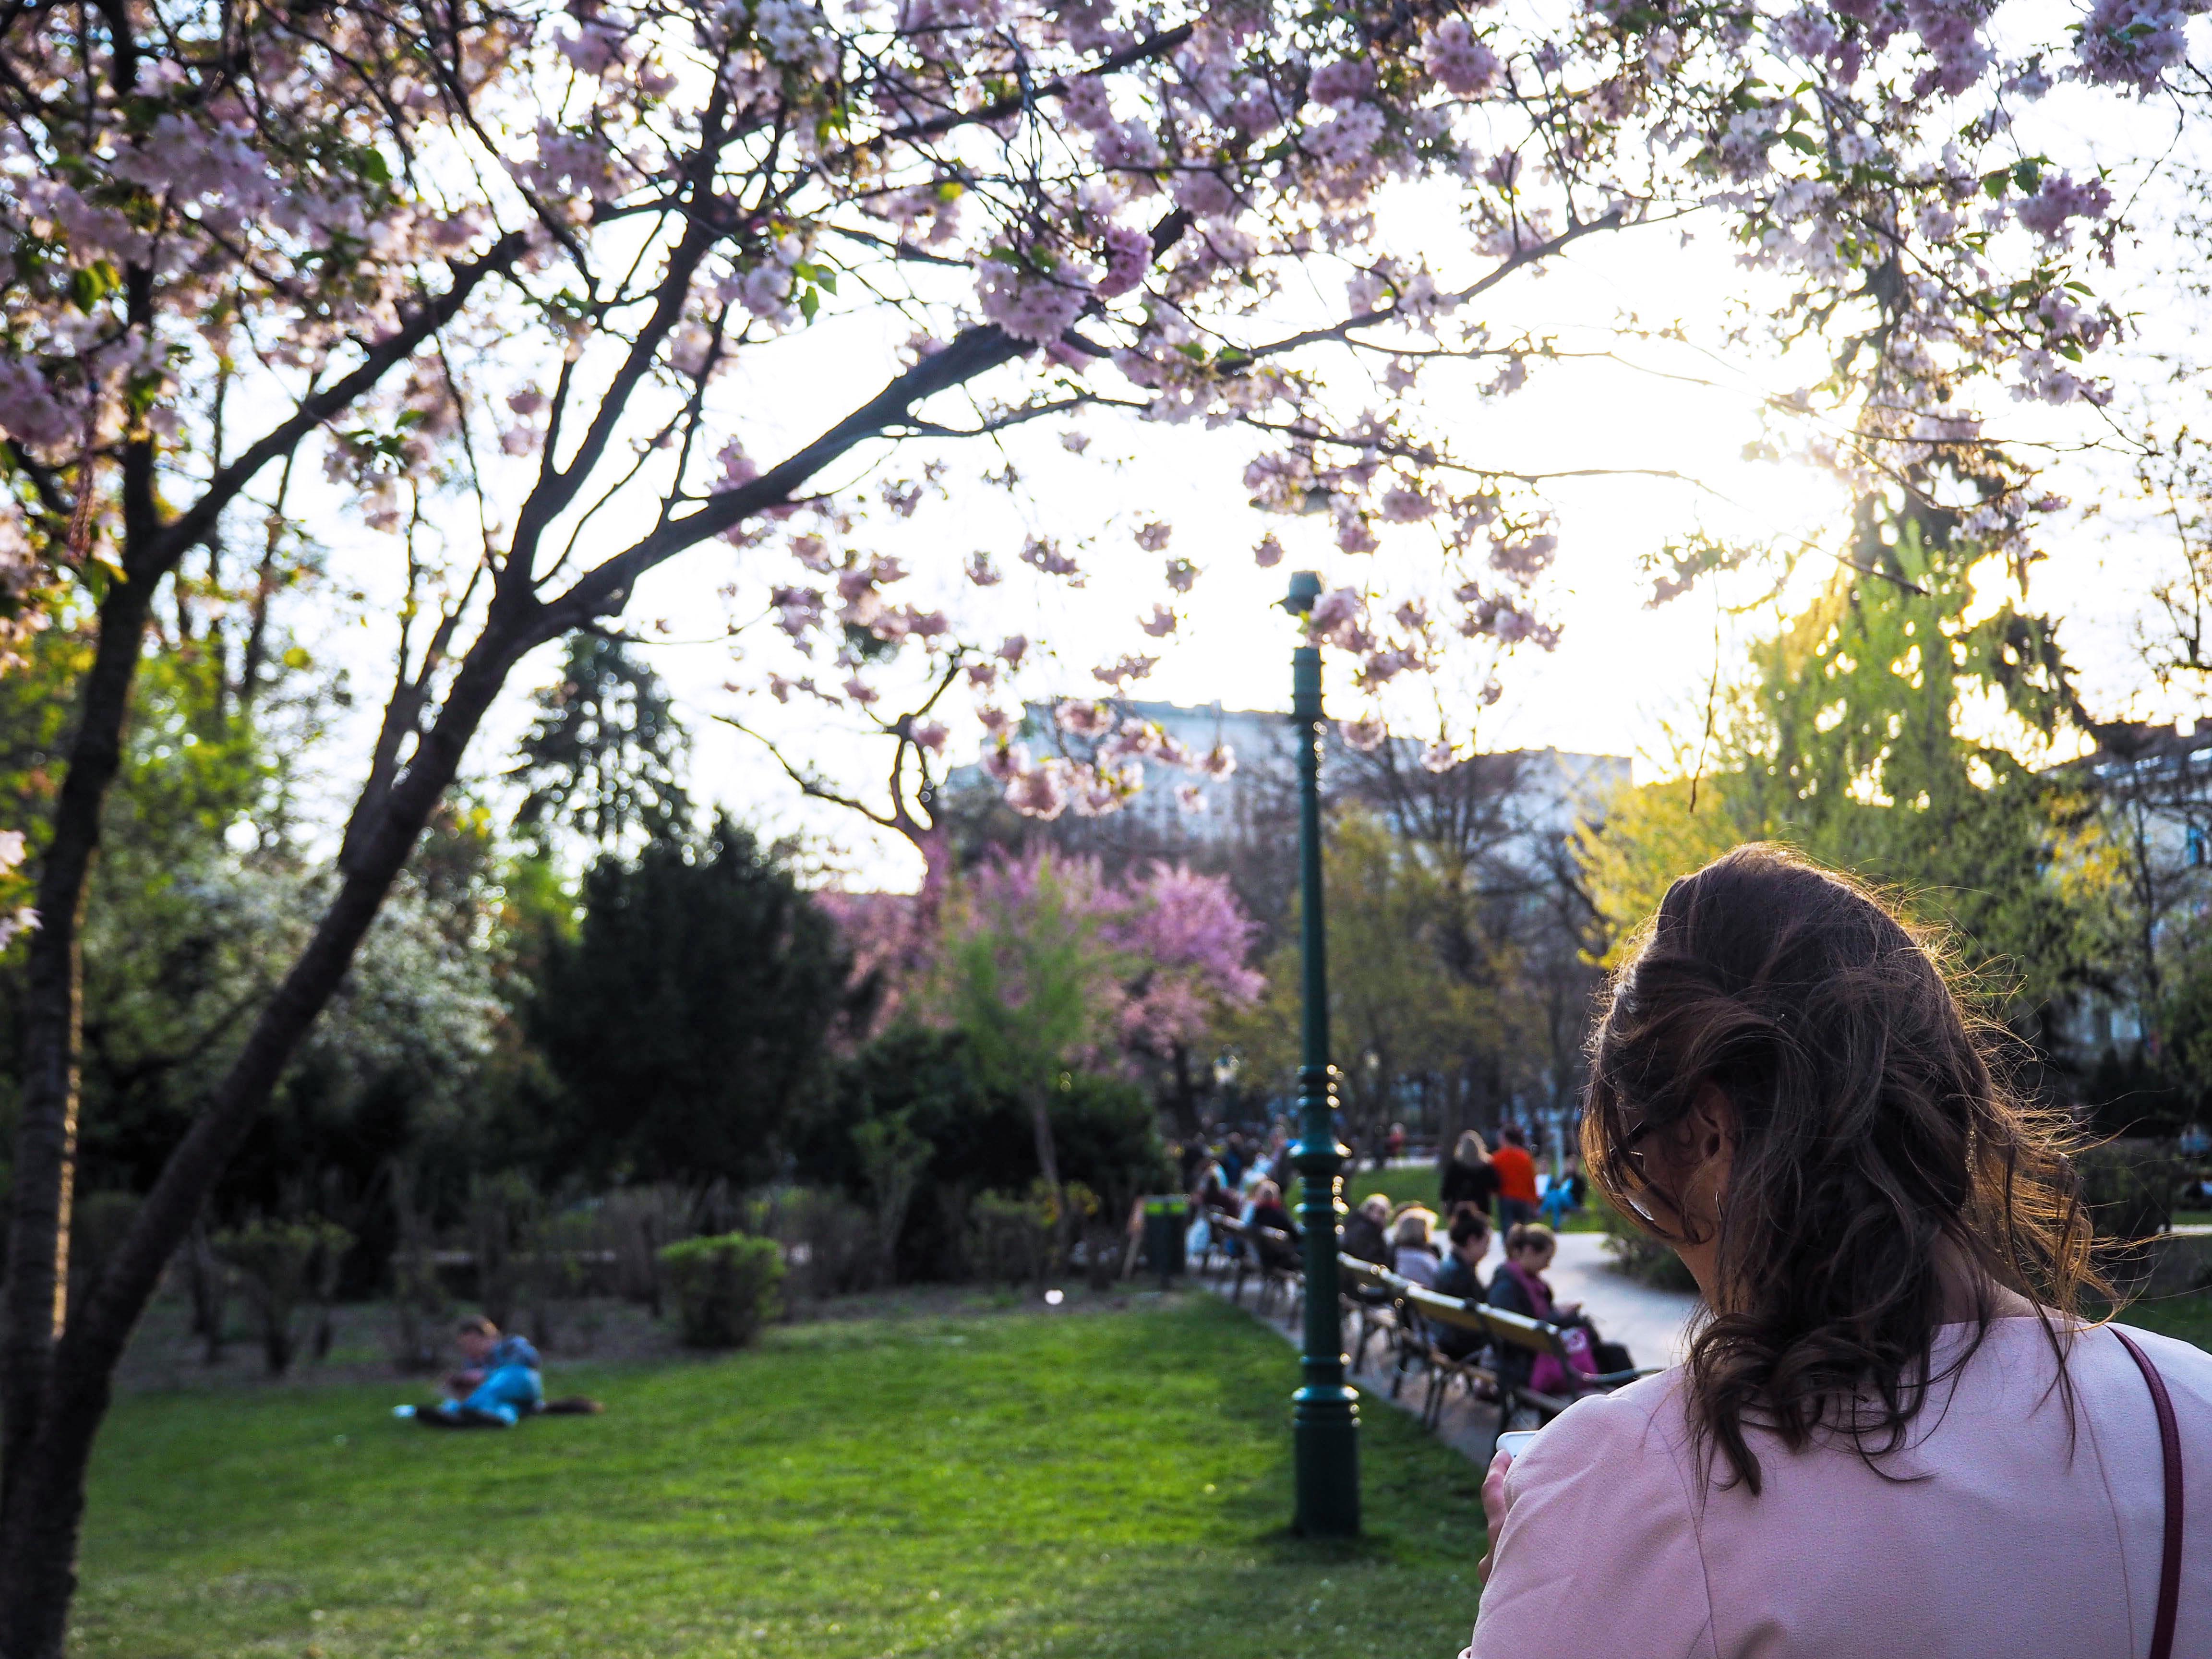 cherry-blossom-sakura-spring-look-rosé-mantel-h&m-tellerrock-fashion-my-look-plus-size-blogger-kardiaserena-furla-bag